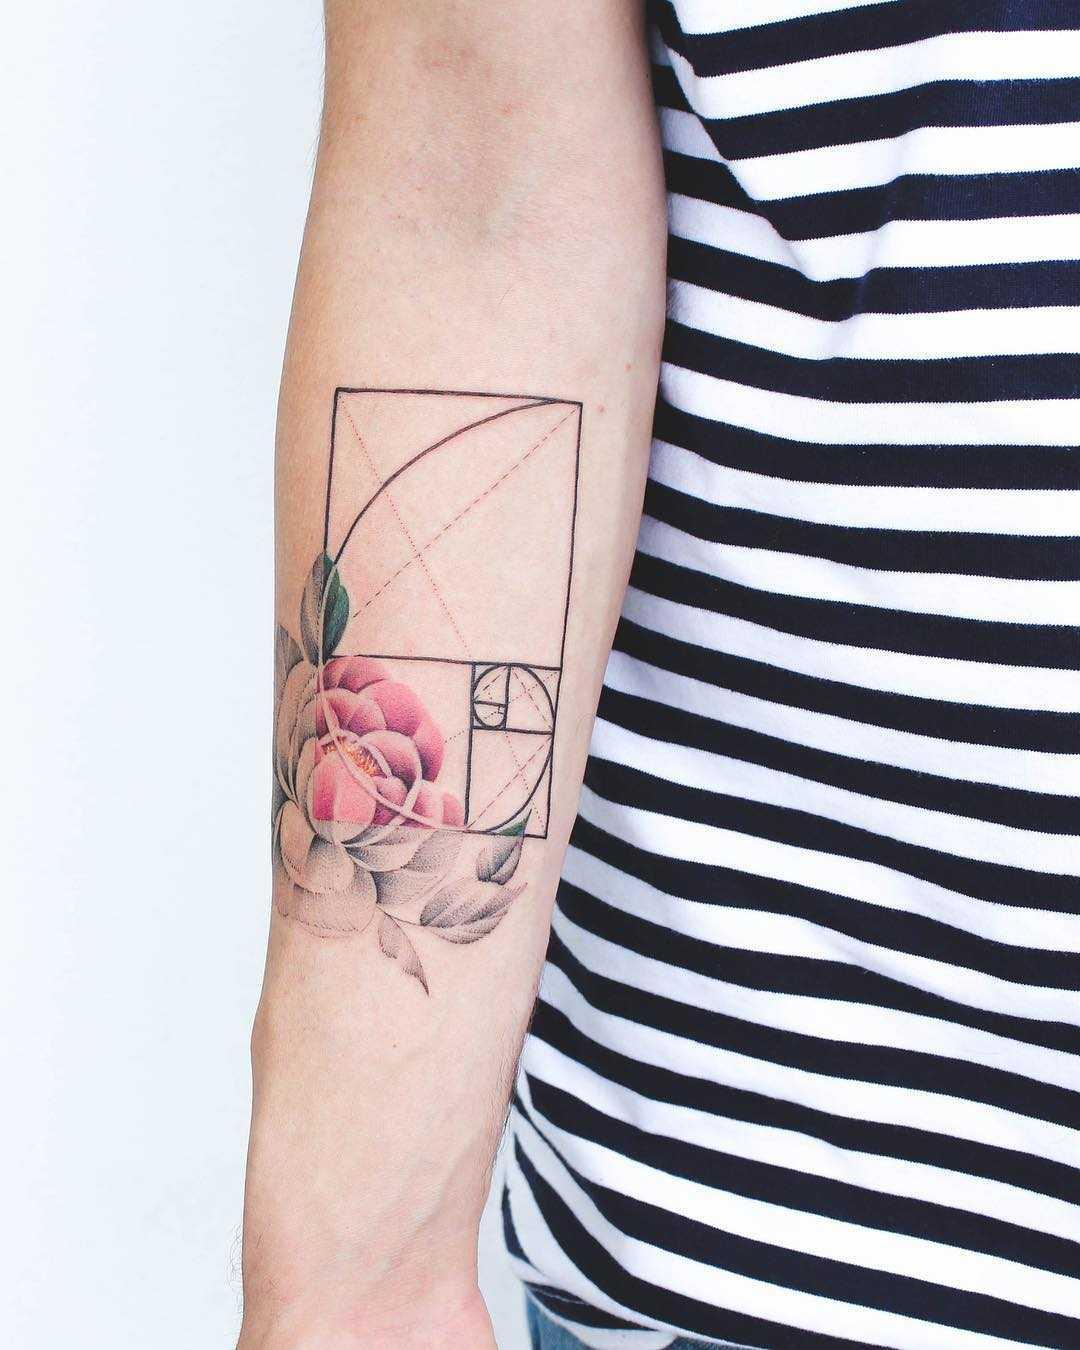 Floral golden ratio tattoo